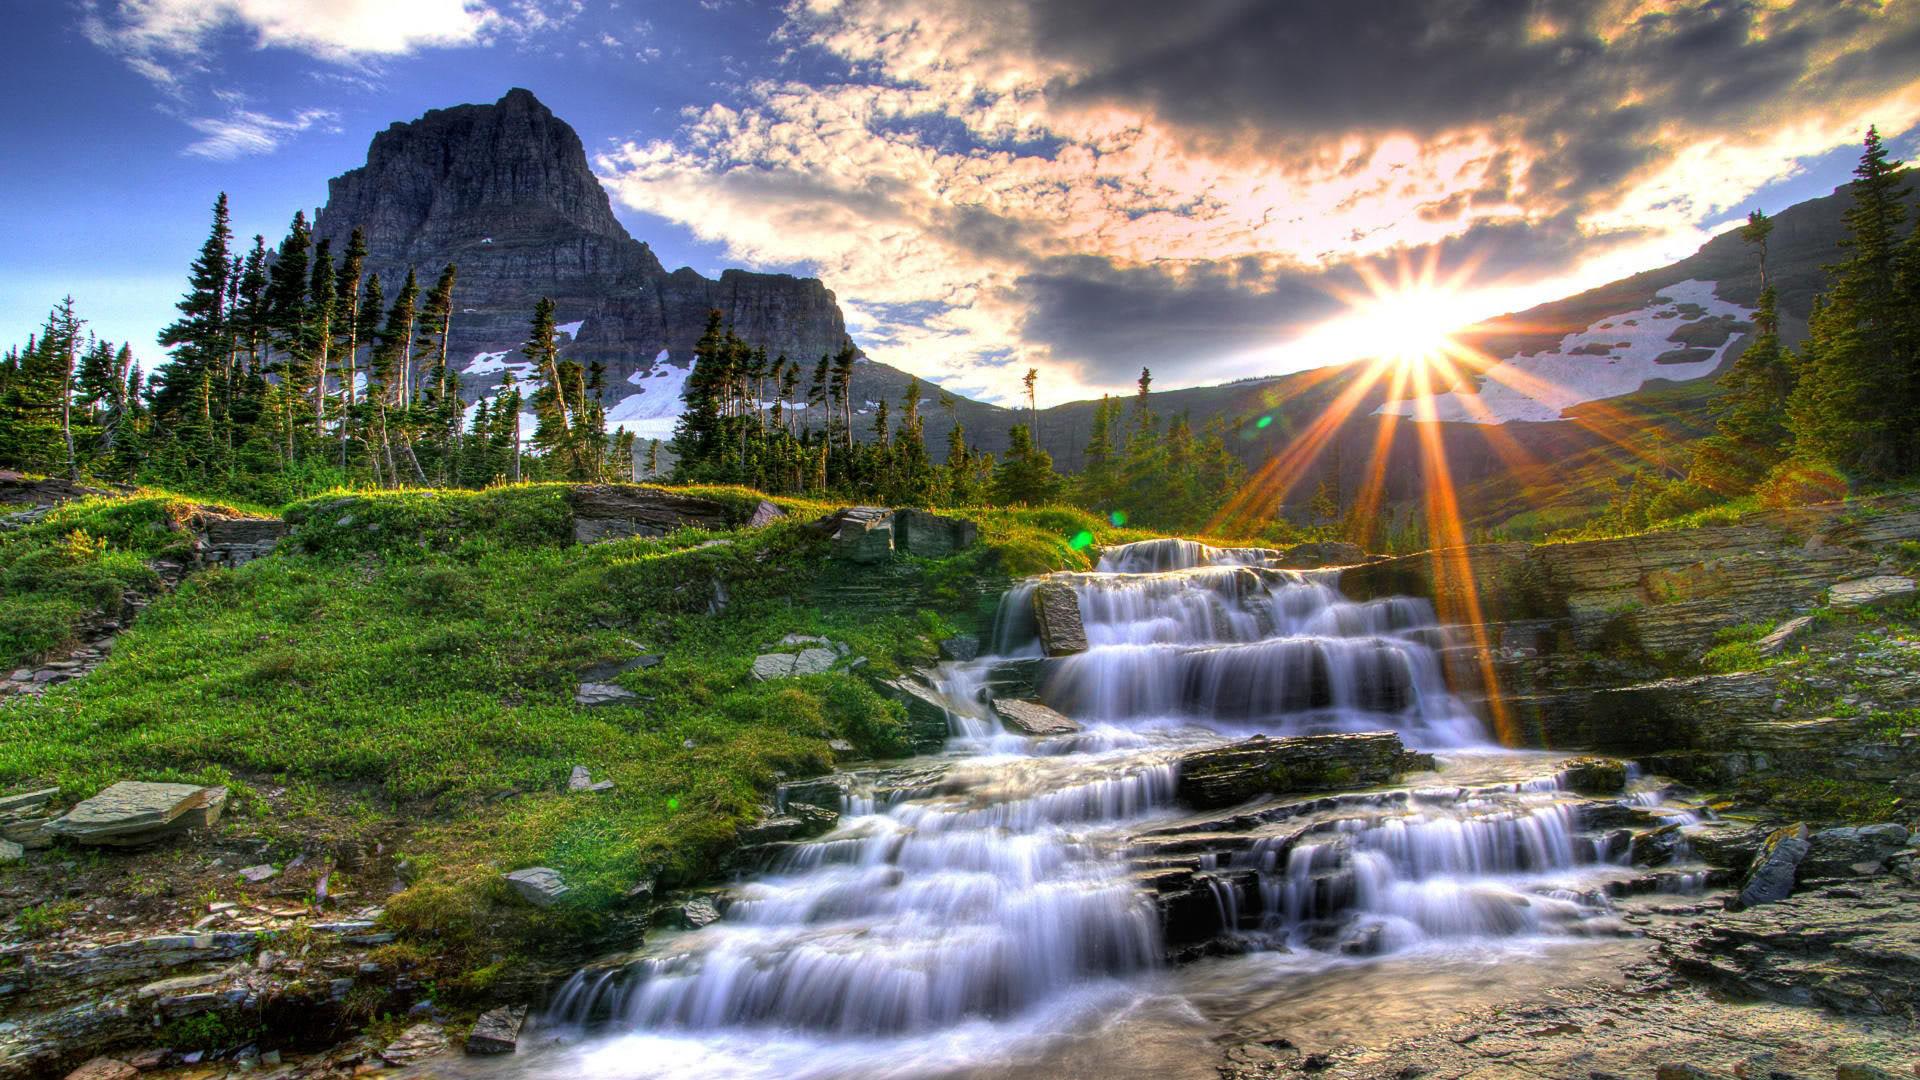 Top Wallpaper High Quality Waterfall - 3798_waterfall  Graphic_94153.jpg